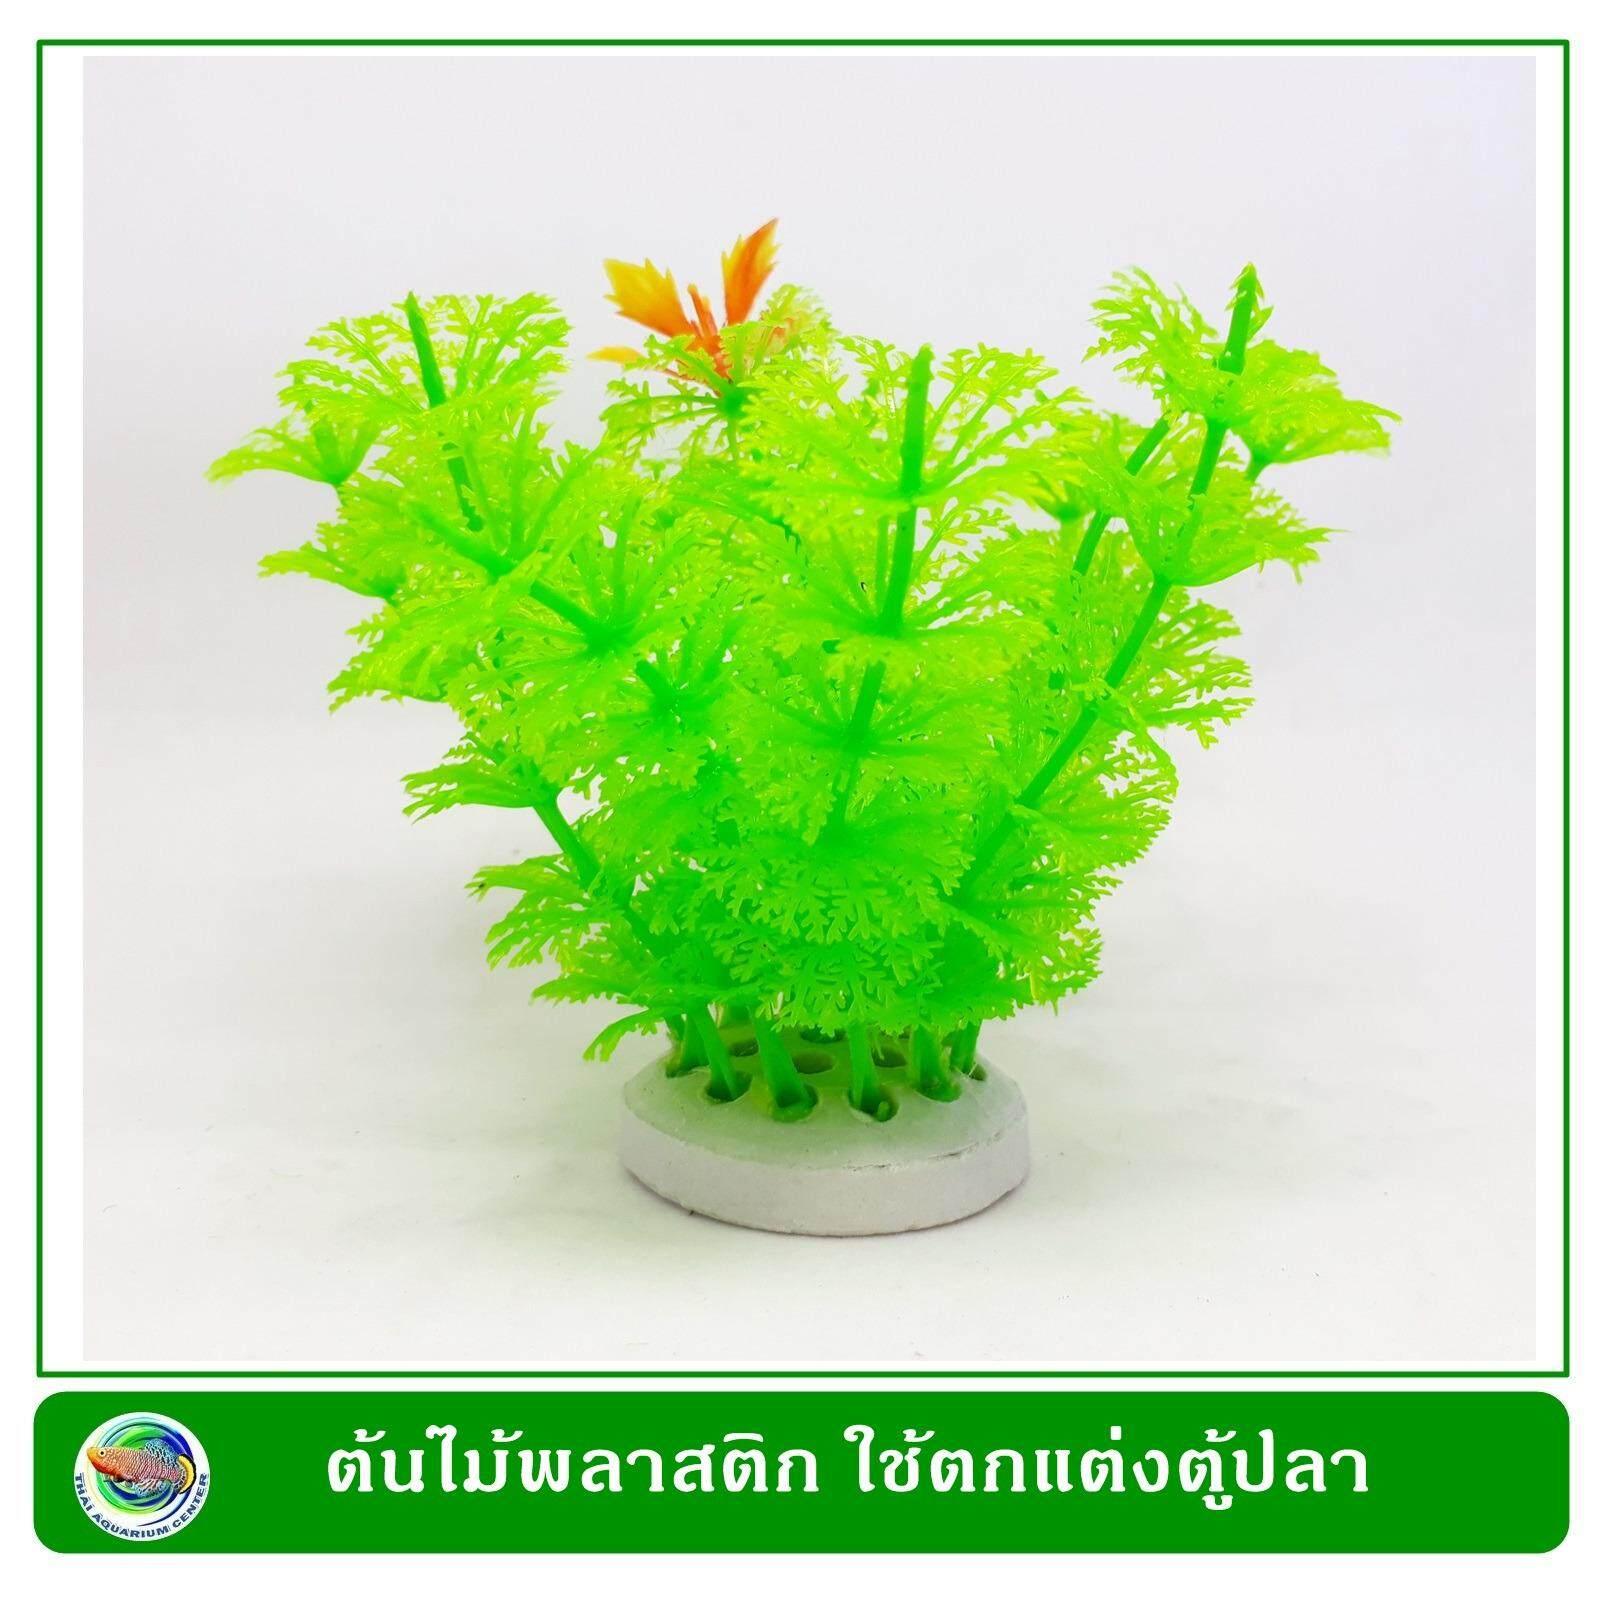 T015 ต้นไม้ทรงพุ่มสีเขียวสด ใช้ตกแต่งตู้ปลาให้สวยงาม By Thai Aquarium Center Co., Ltd..